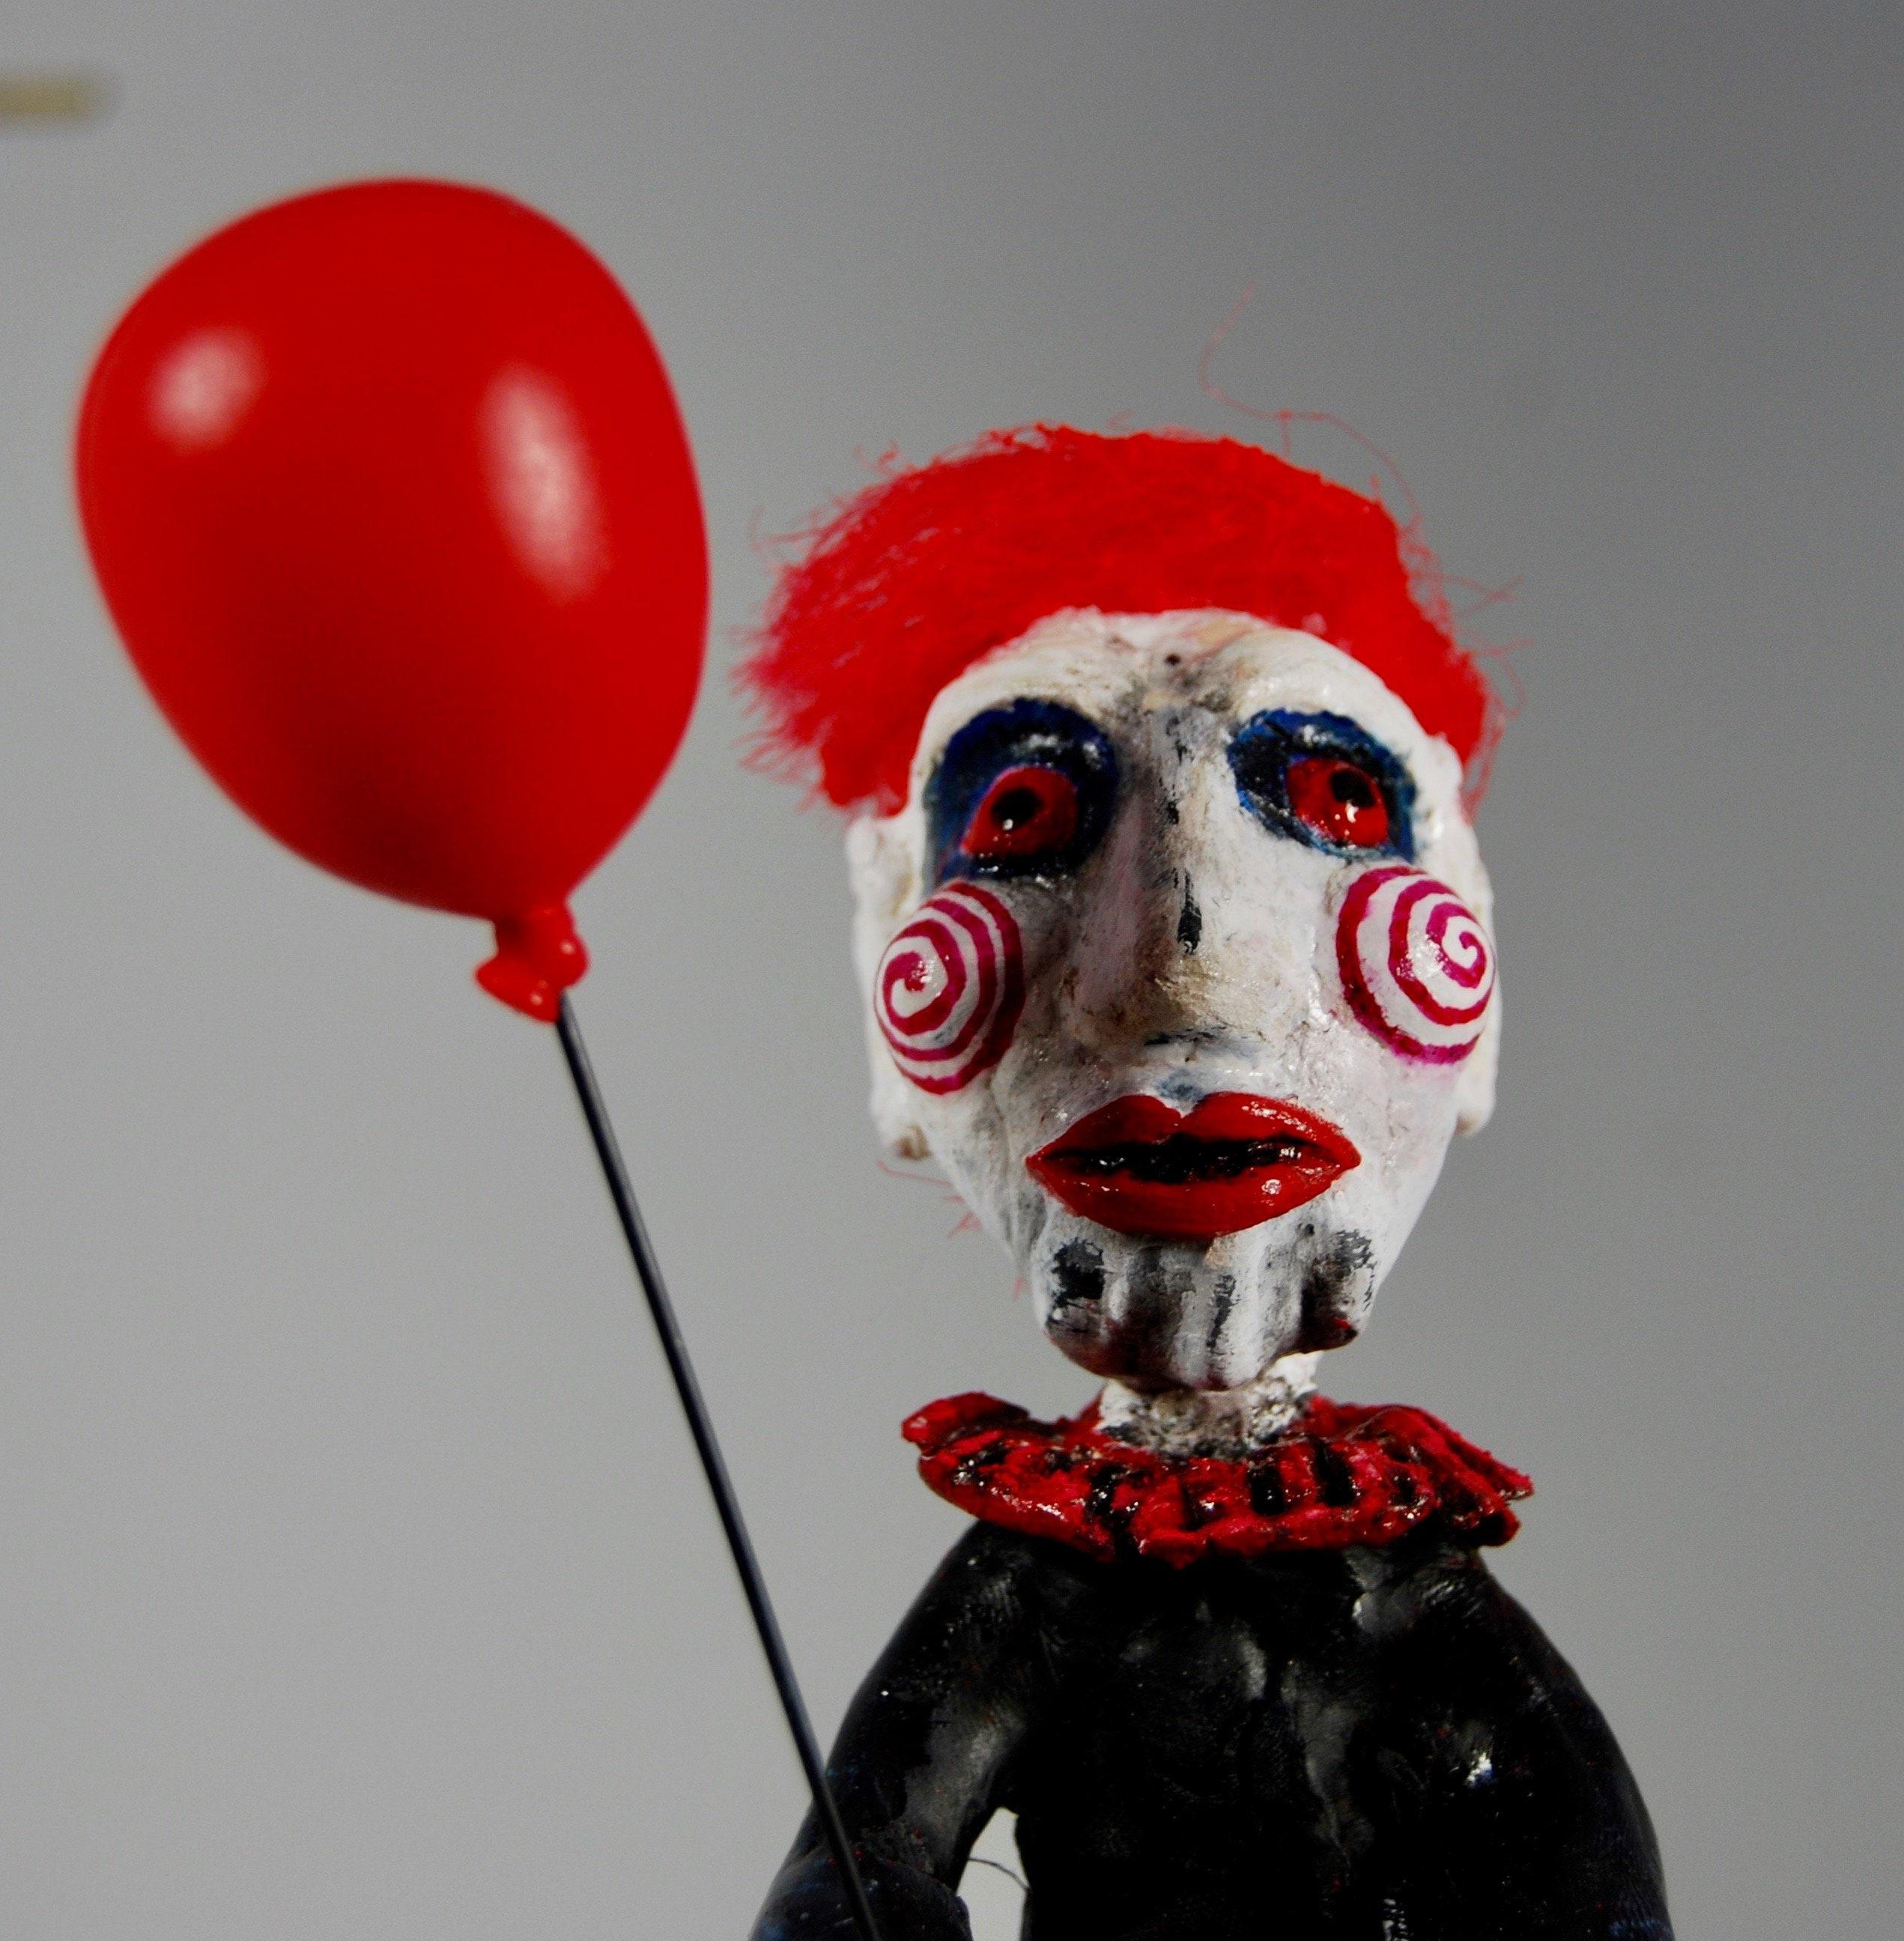 Jigsaw Creepy Clown/ Scary Movie Inspired Clown/Fear of Clowns